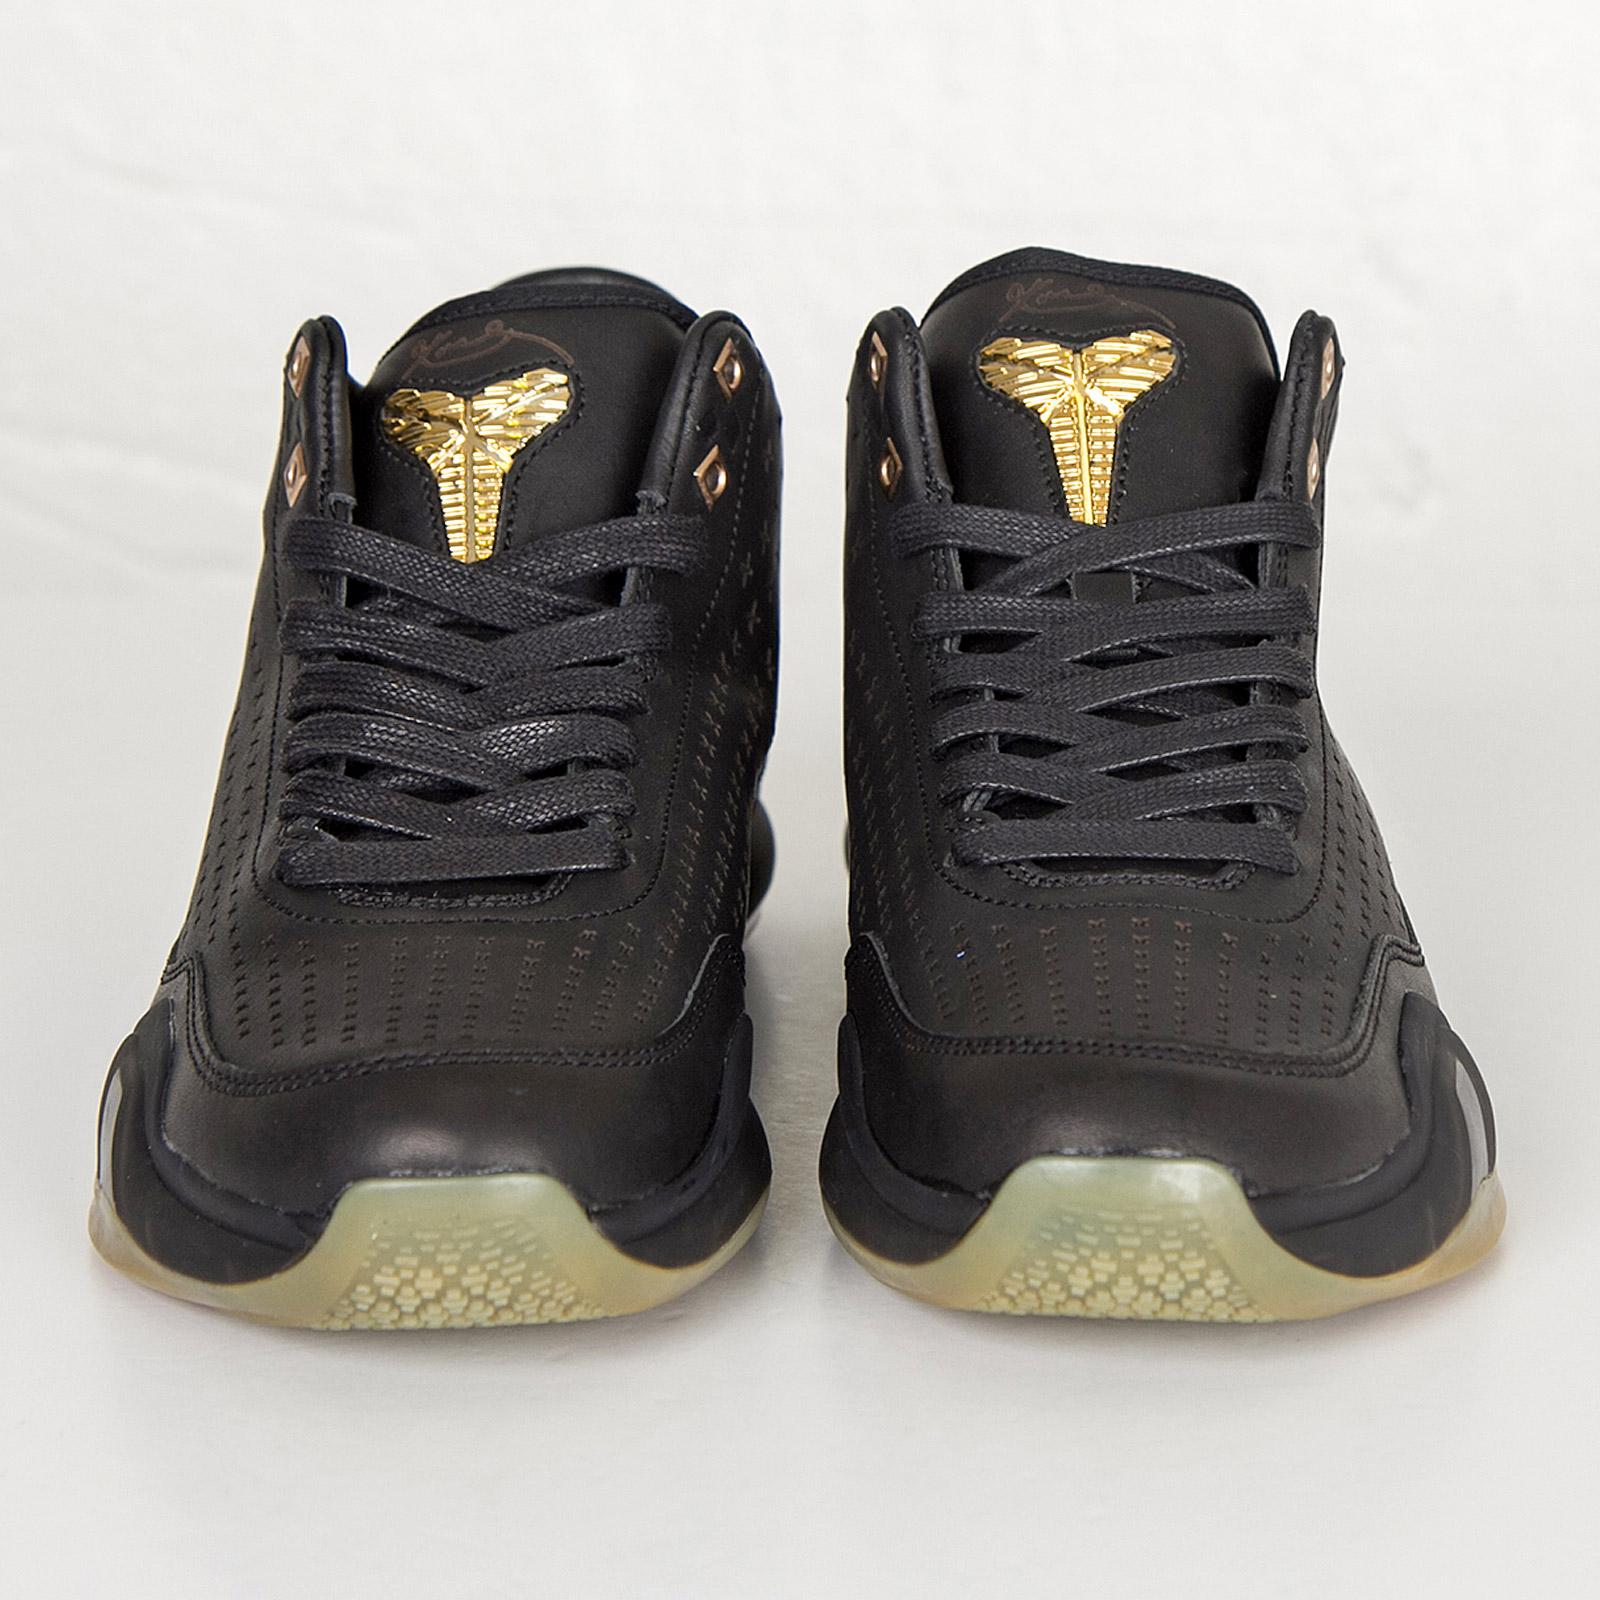 Nike Kobe X Mid EXT - 802366-002